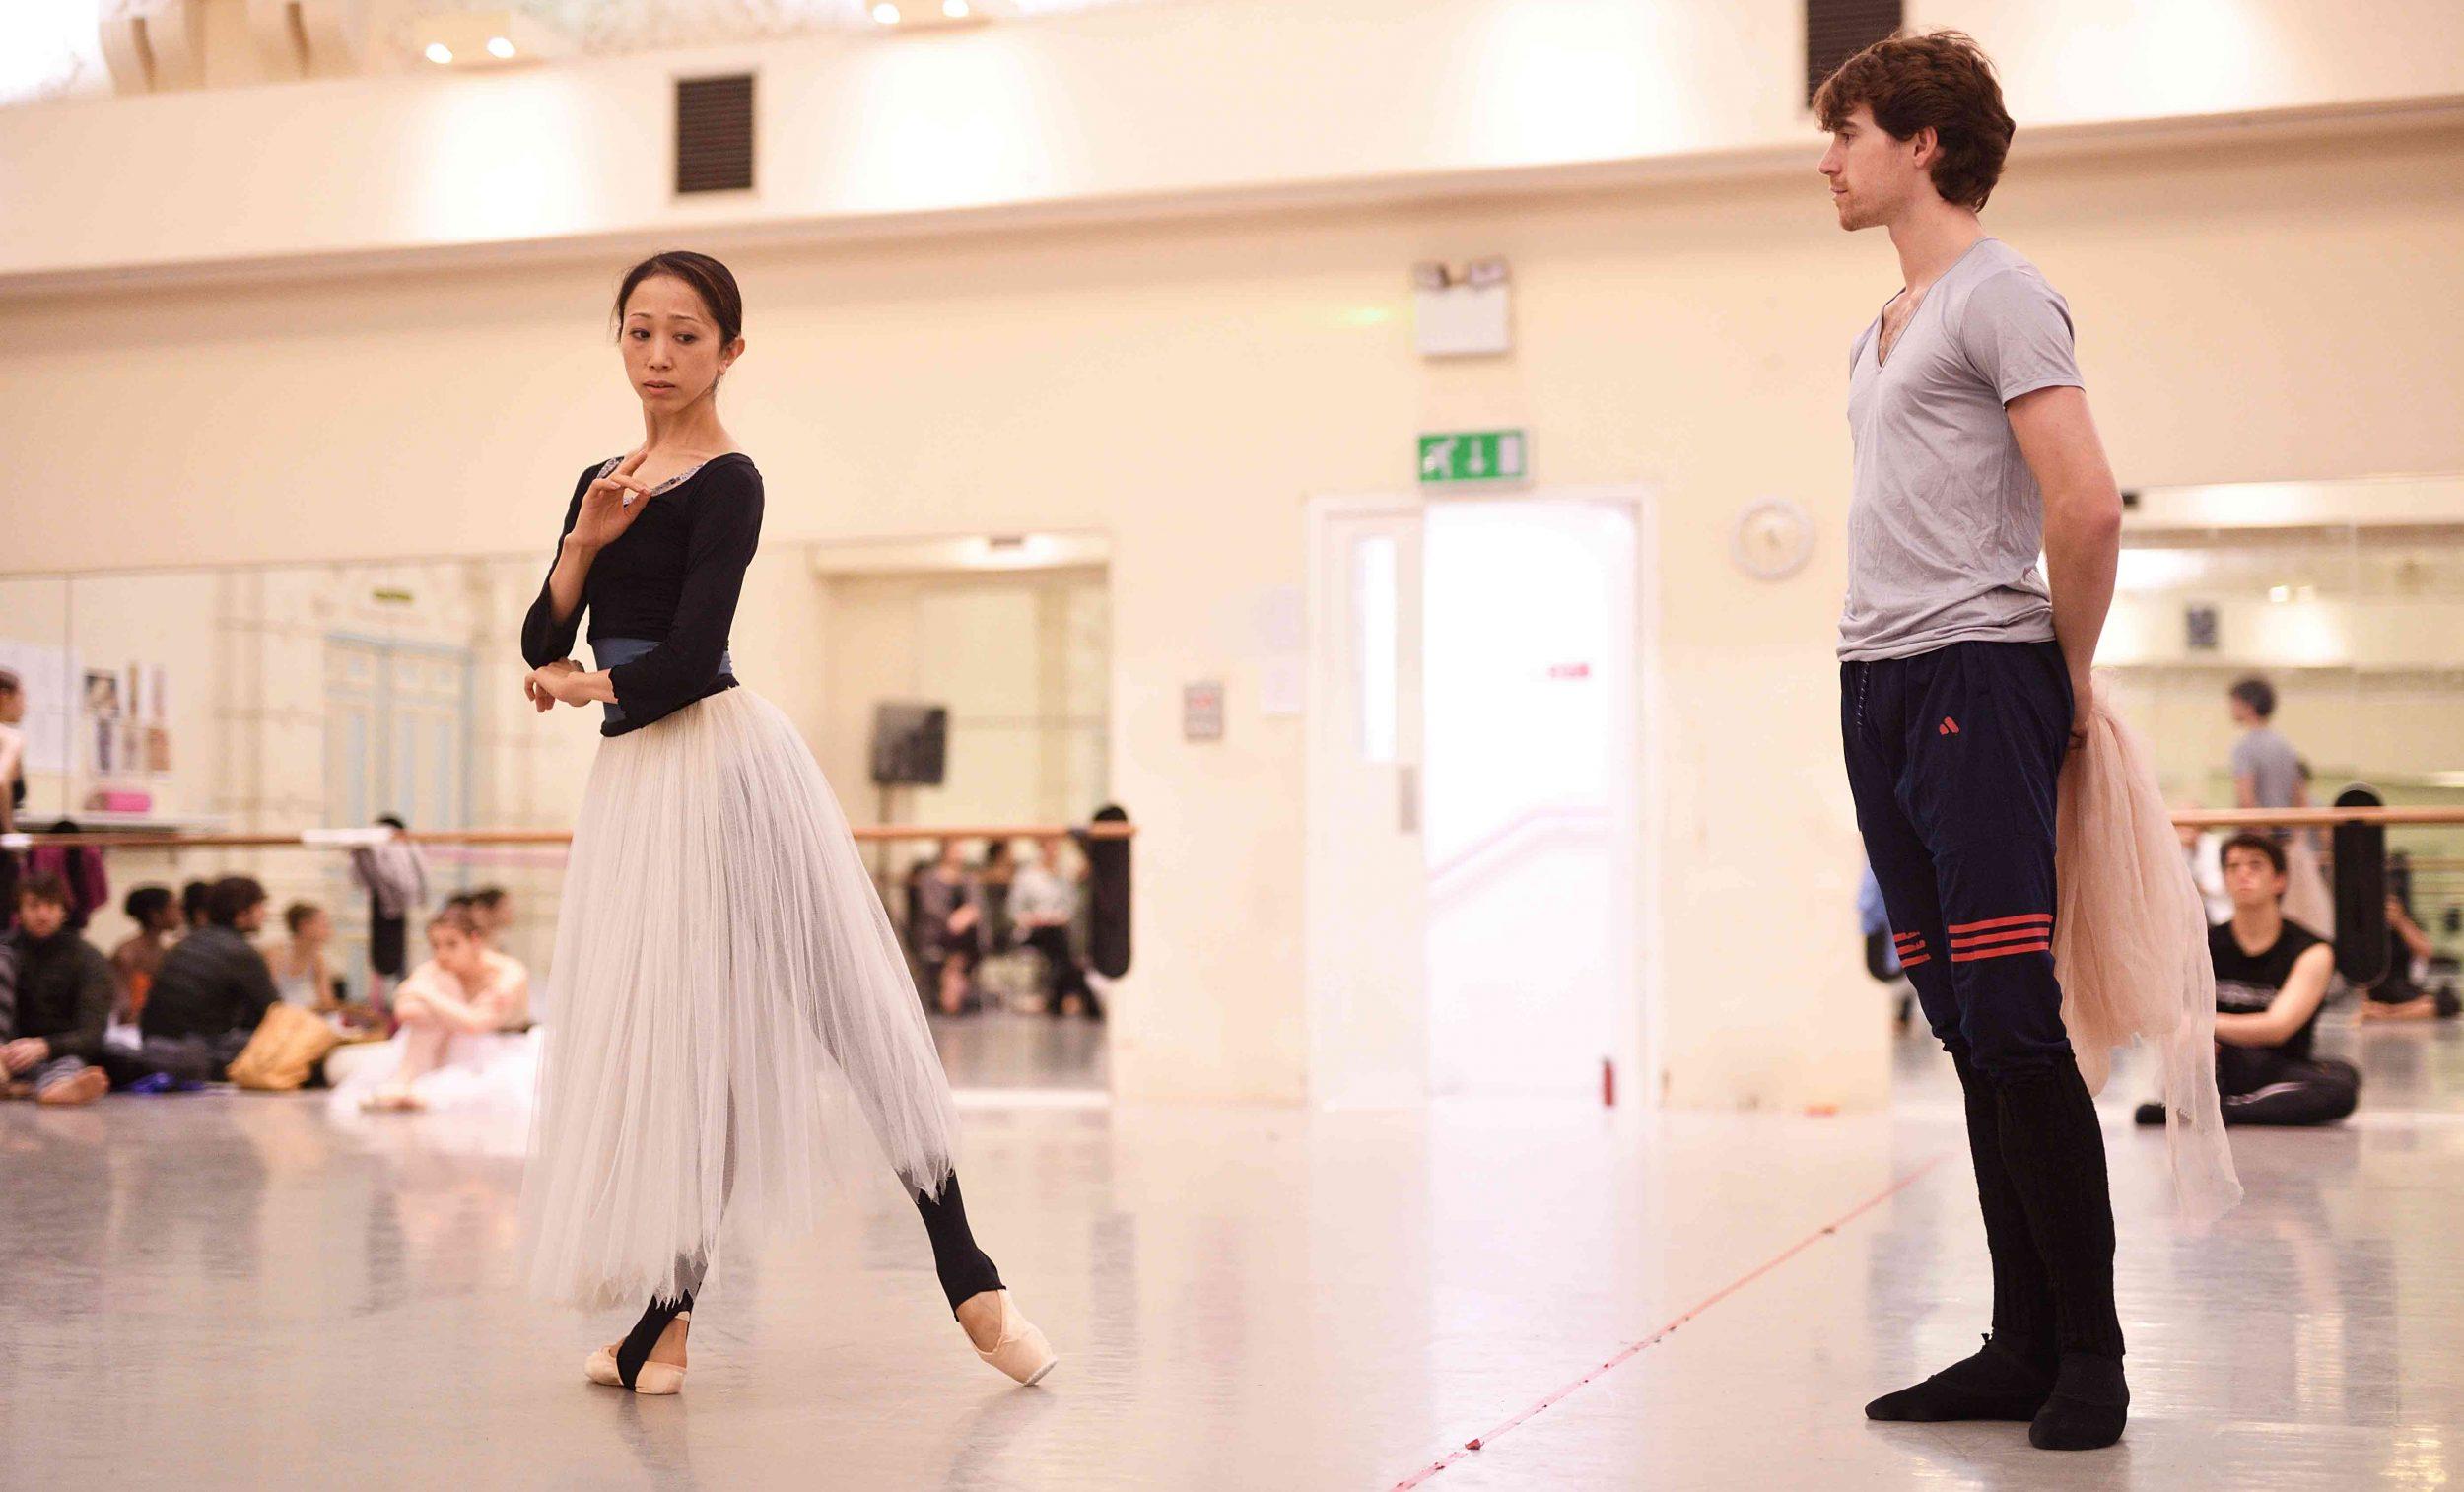 Erina-Takahashi-and-Aitor-Arrieta-rehearsing-La-Sylphide-©-Laurent-Liotardo-(2)